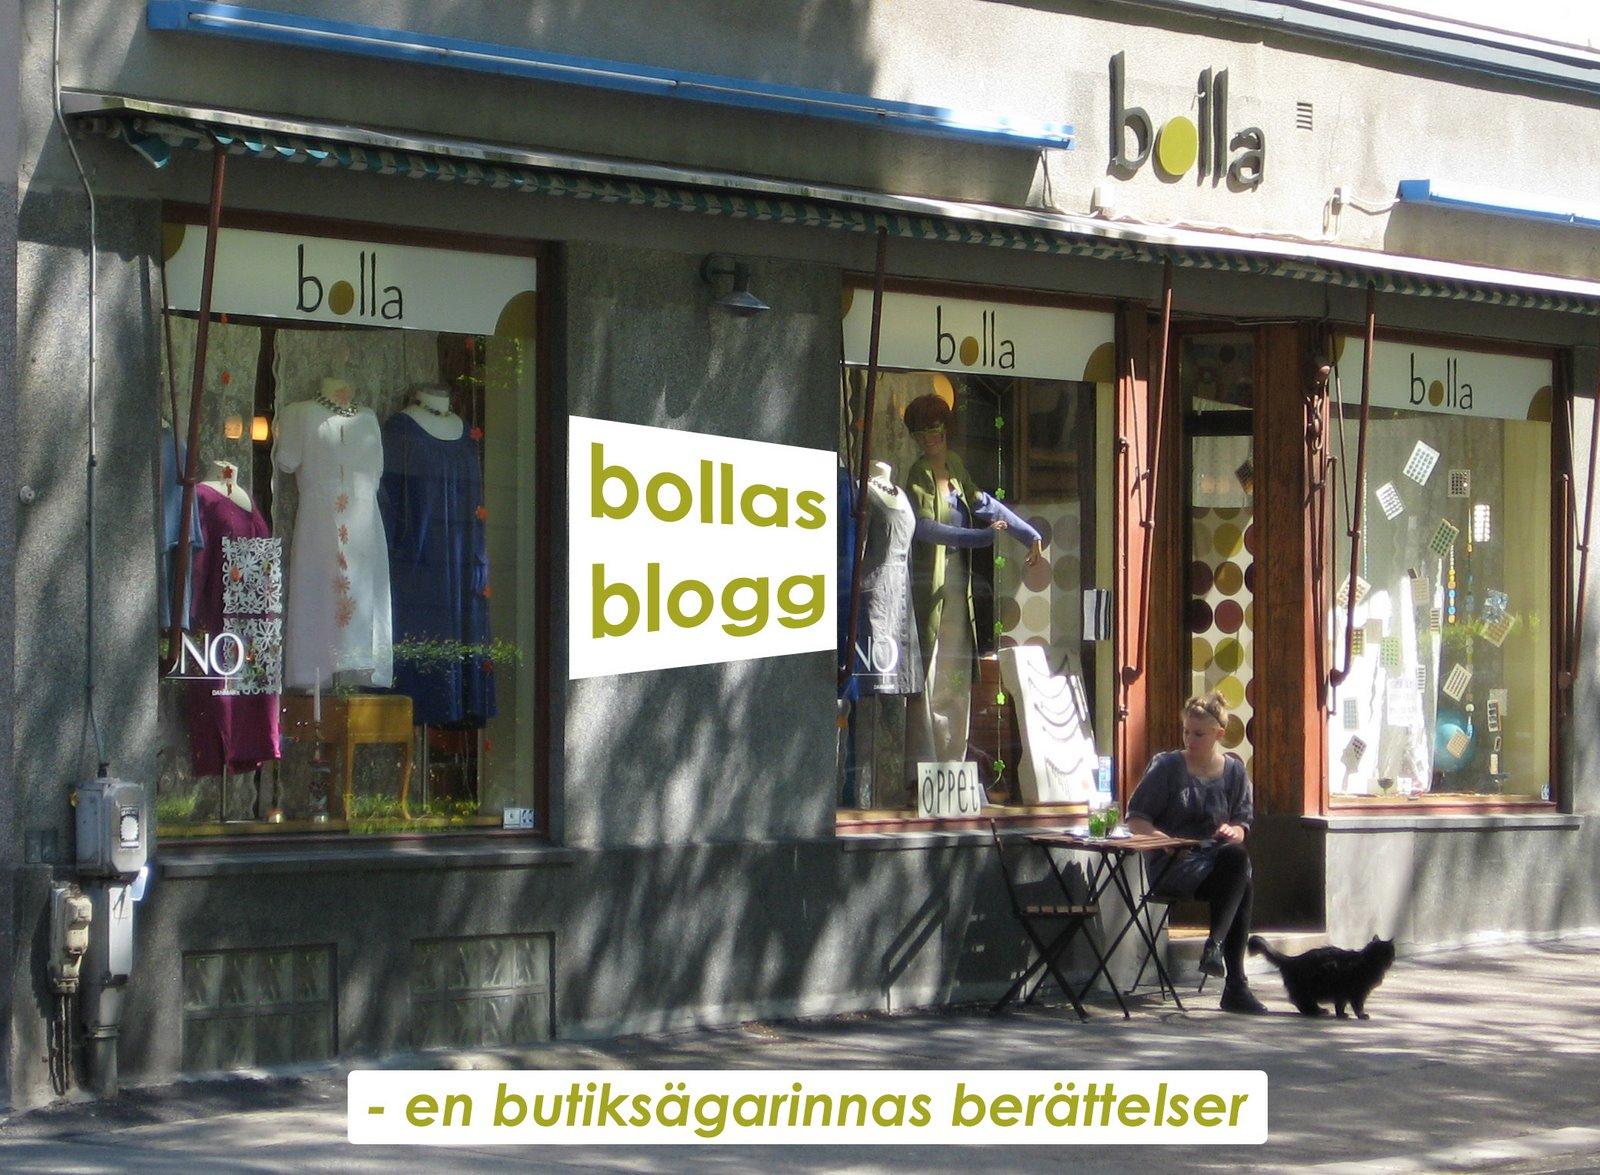 Butik Bolla bloggar